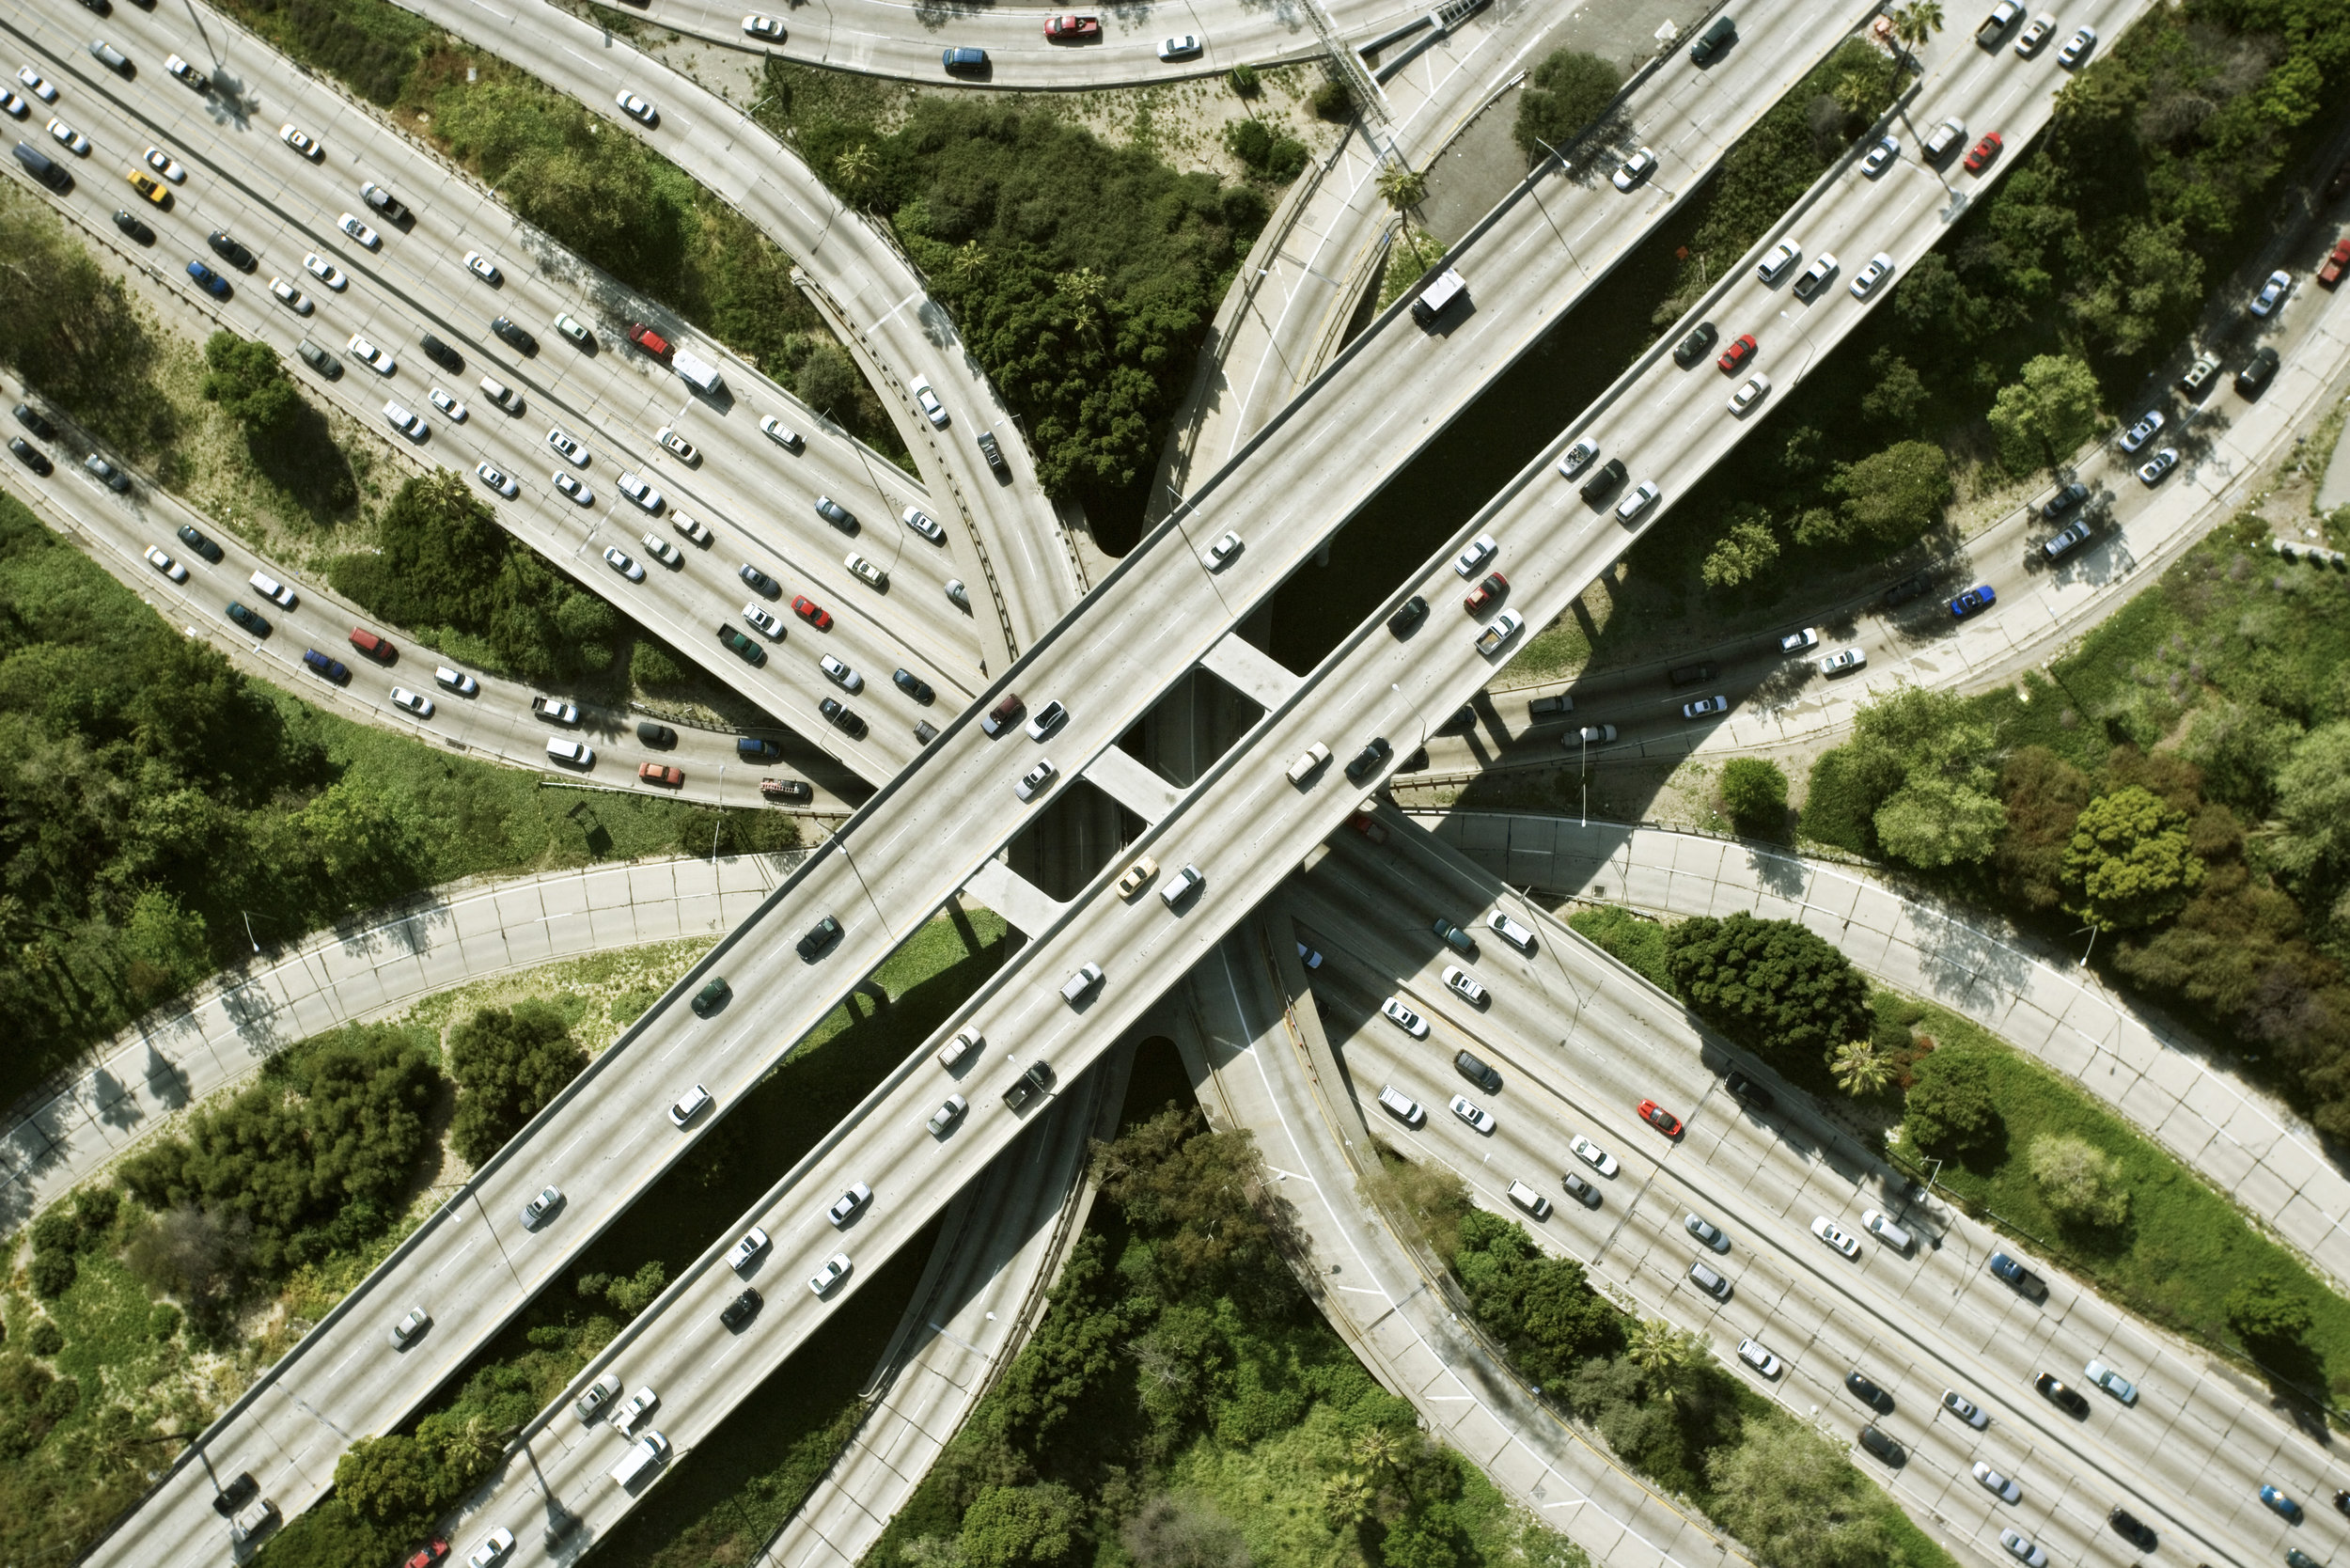 Event Transportation Coordination - Volunteer Role